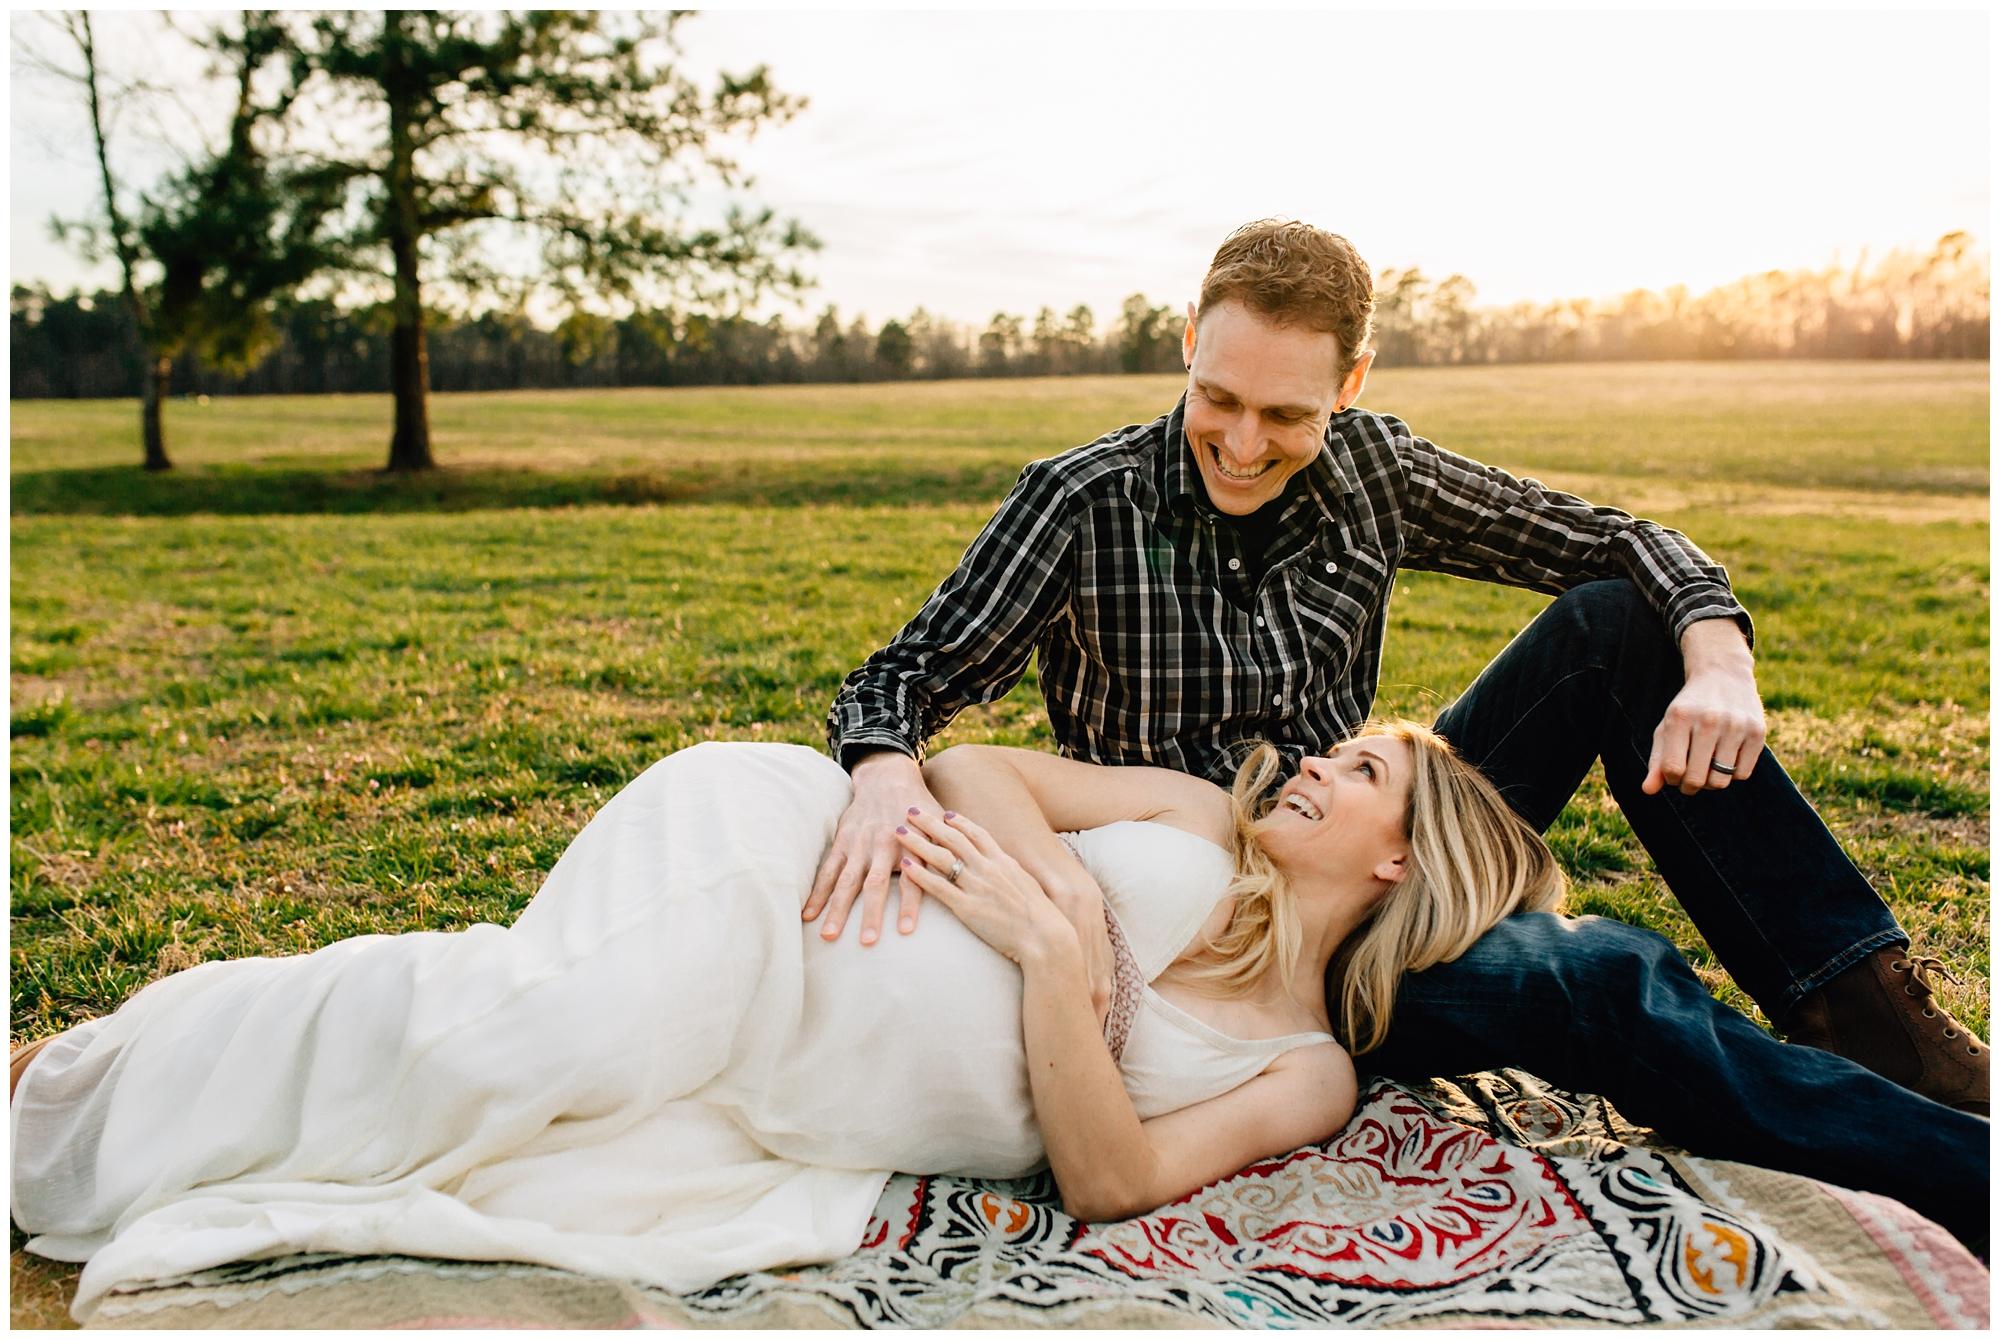 outdoor-maternity-portraits-6.jpg